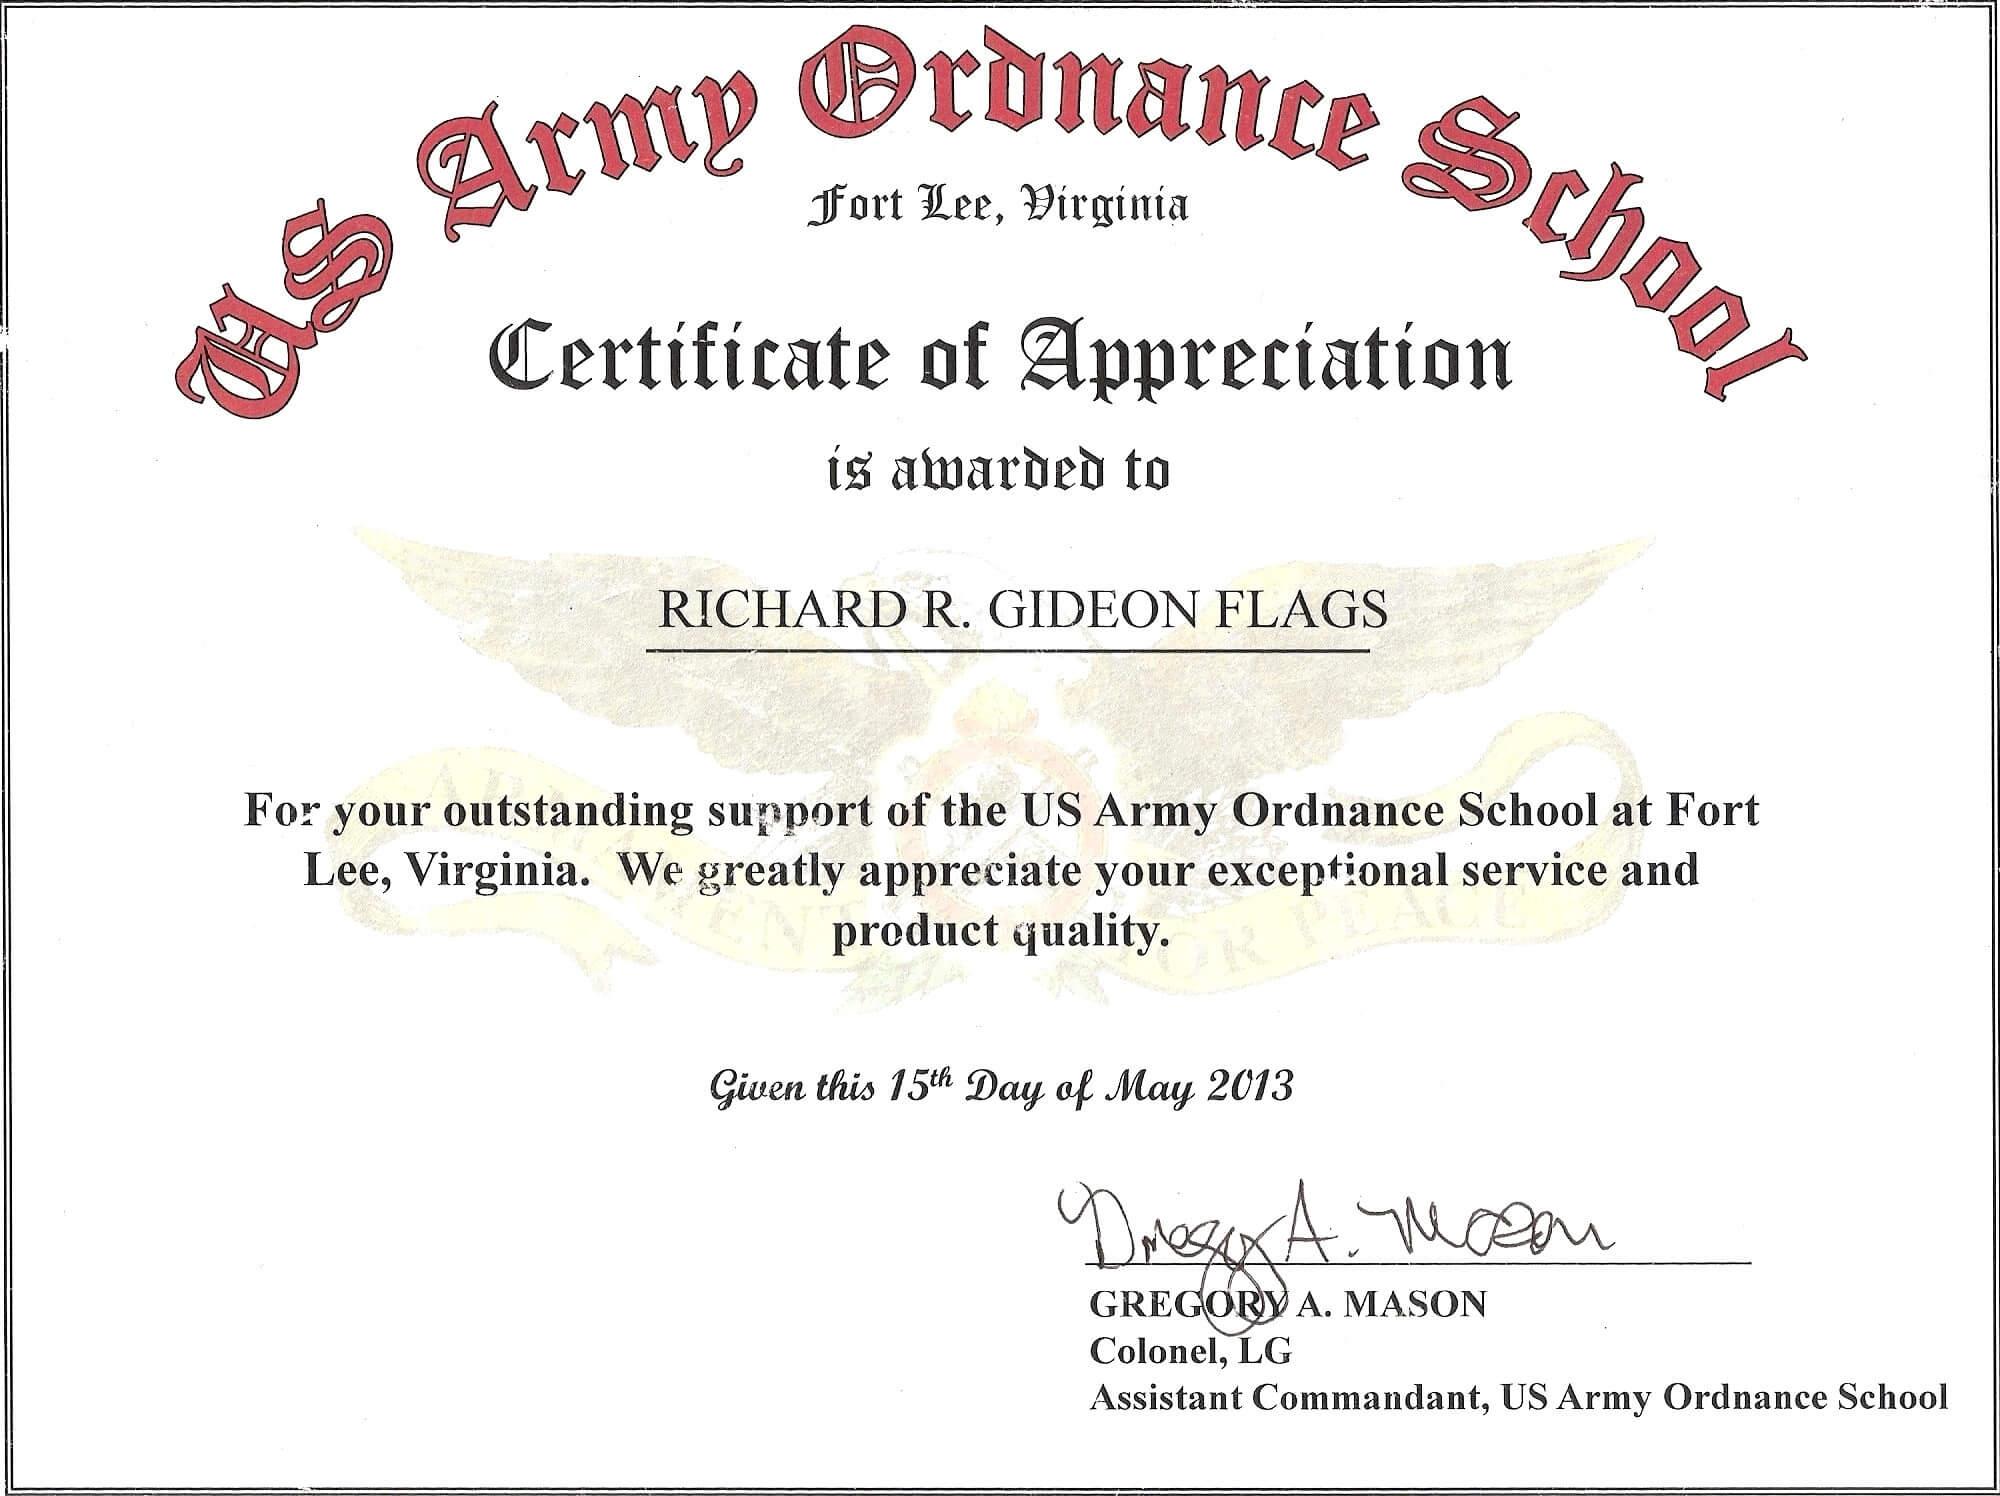 Certificate Of Achievement Template Microsoft Word - Yupar pertaining to Certificate Of Achievement Army Template